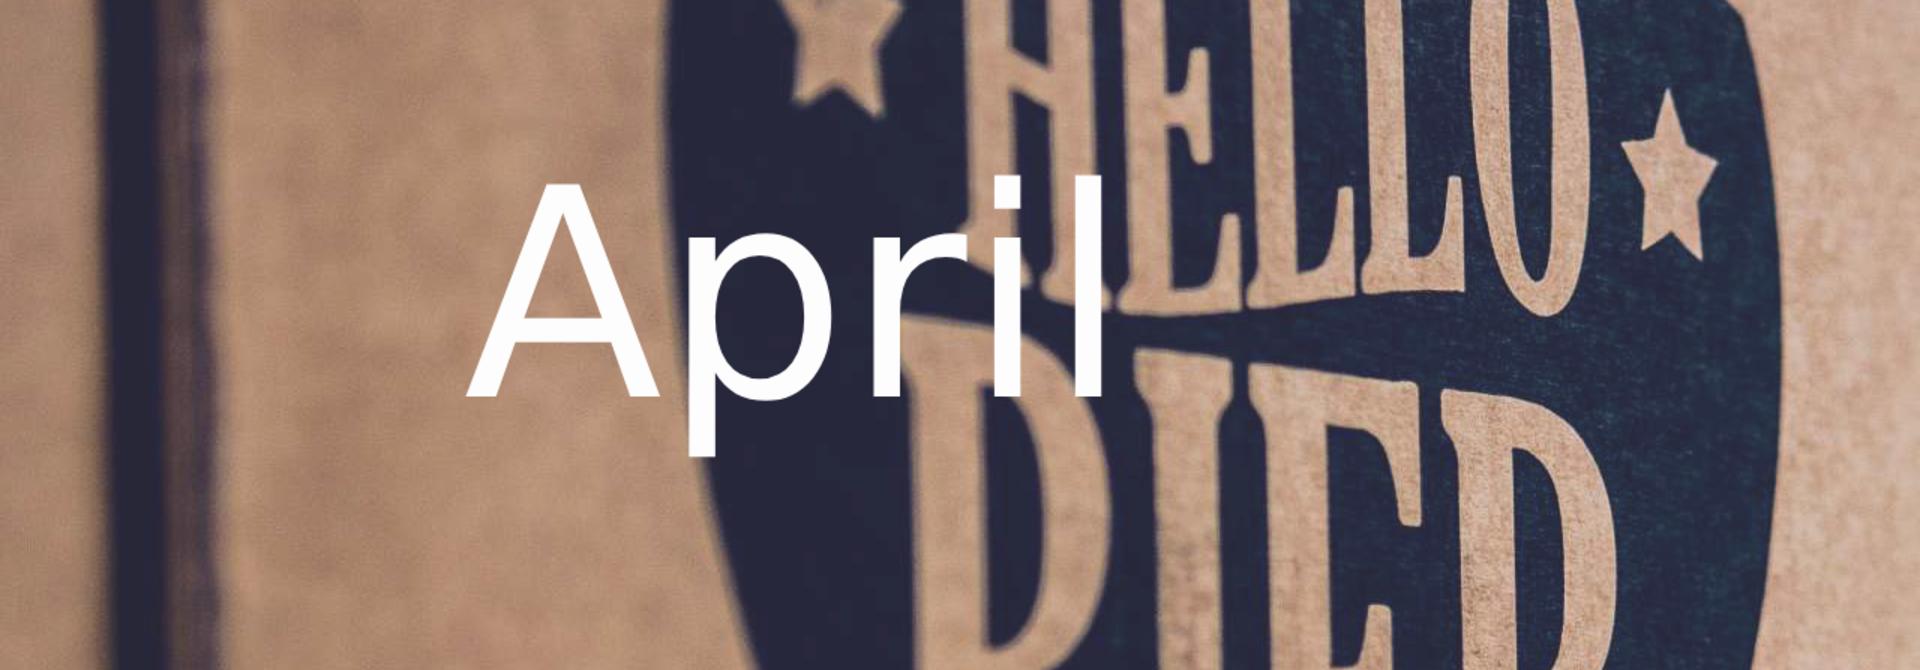 Speciaalbier – bierpakket april 2018